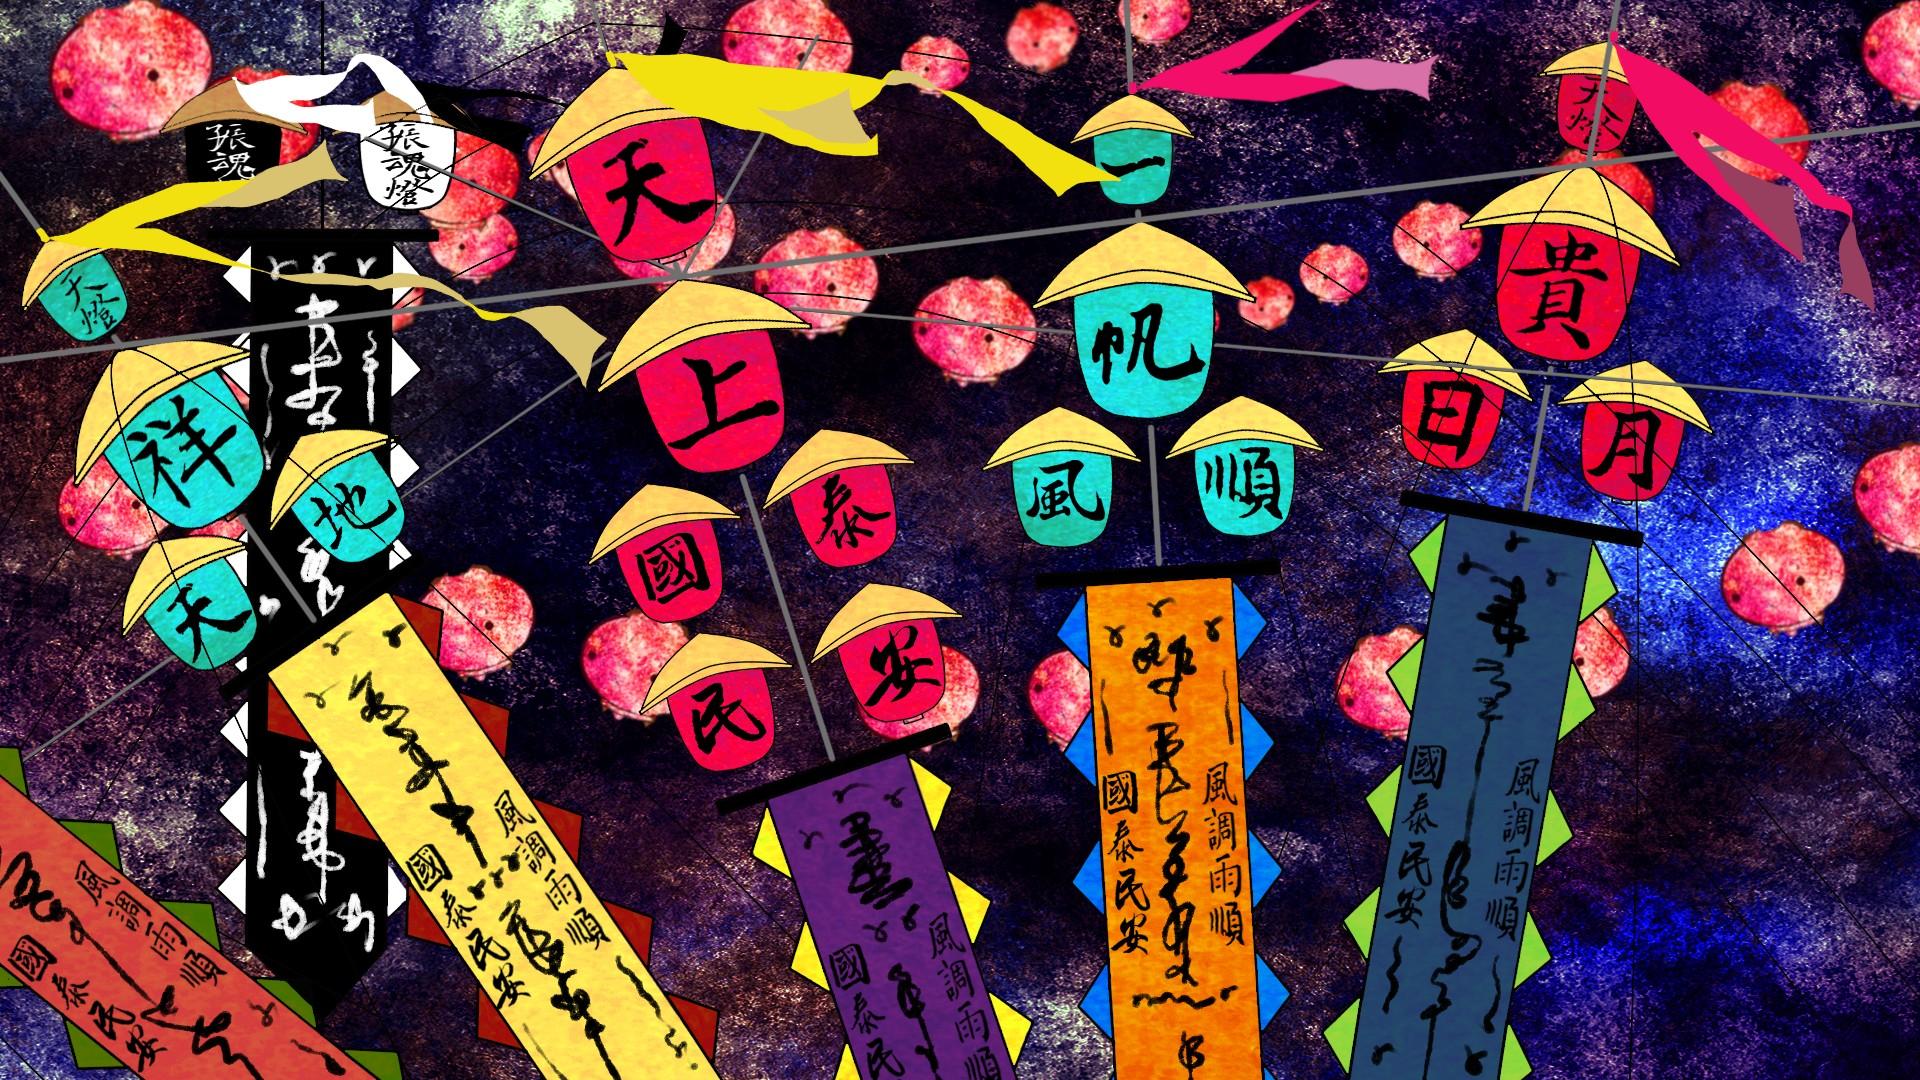 - 作品名称:《作醮》导演:郑孔训制片:郑孔训国家/地区:中国创作时间:2013-2014 编剧:郑孔训美术:郑孔训音乐:郑孔训,洪敏懿片长:2分16秒Title: The Temple Affair Director: Zheng Kongxun Producer(s): Zheng Kongxun Country/Area: China Year of Production: 2013-2014 Screenplay: Zheng Kongxun Design: Zheng KongxunMusic: Zheng Kongxun, Hong Minyi Length: 2 mins 16 sec作品介绍这是一部叙述台湾庙会过程的动画短片 , 通过热闹的音乐和绚丽的画面来表现各种庙会中的人物以及习俗。Synopsis This short film is talk about the temple fair of Taiwan, using lively music and colorful scenes to show all kinds of role and custom.